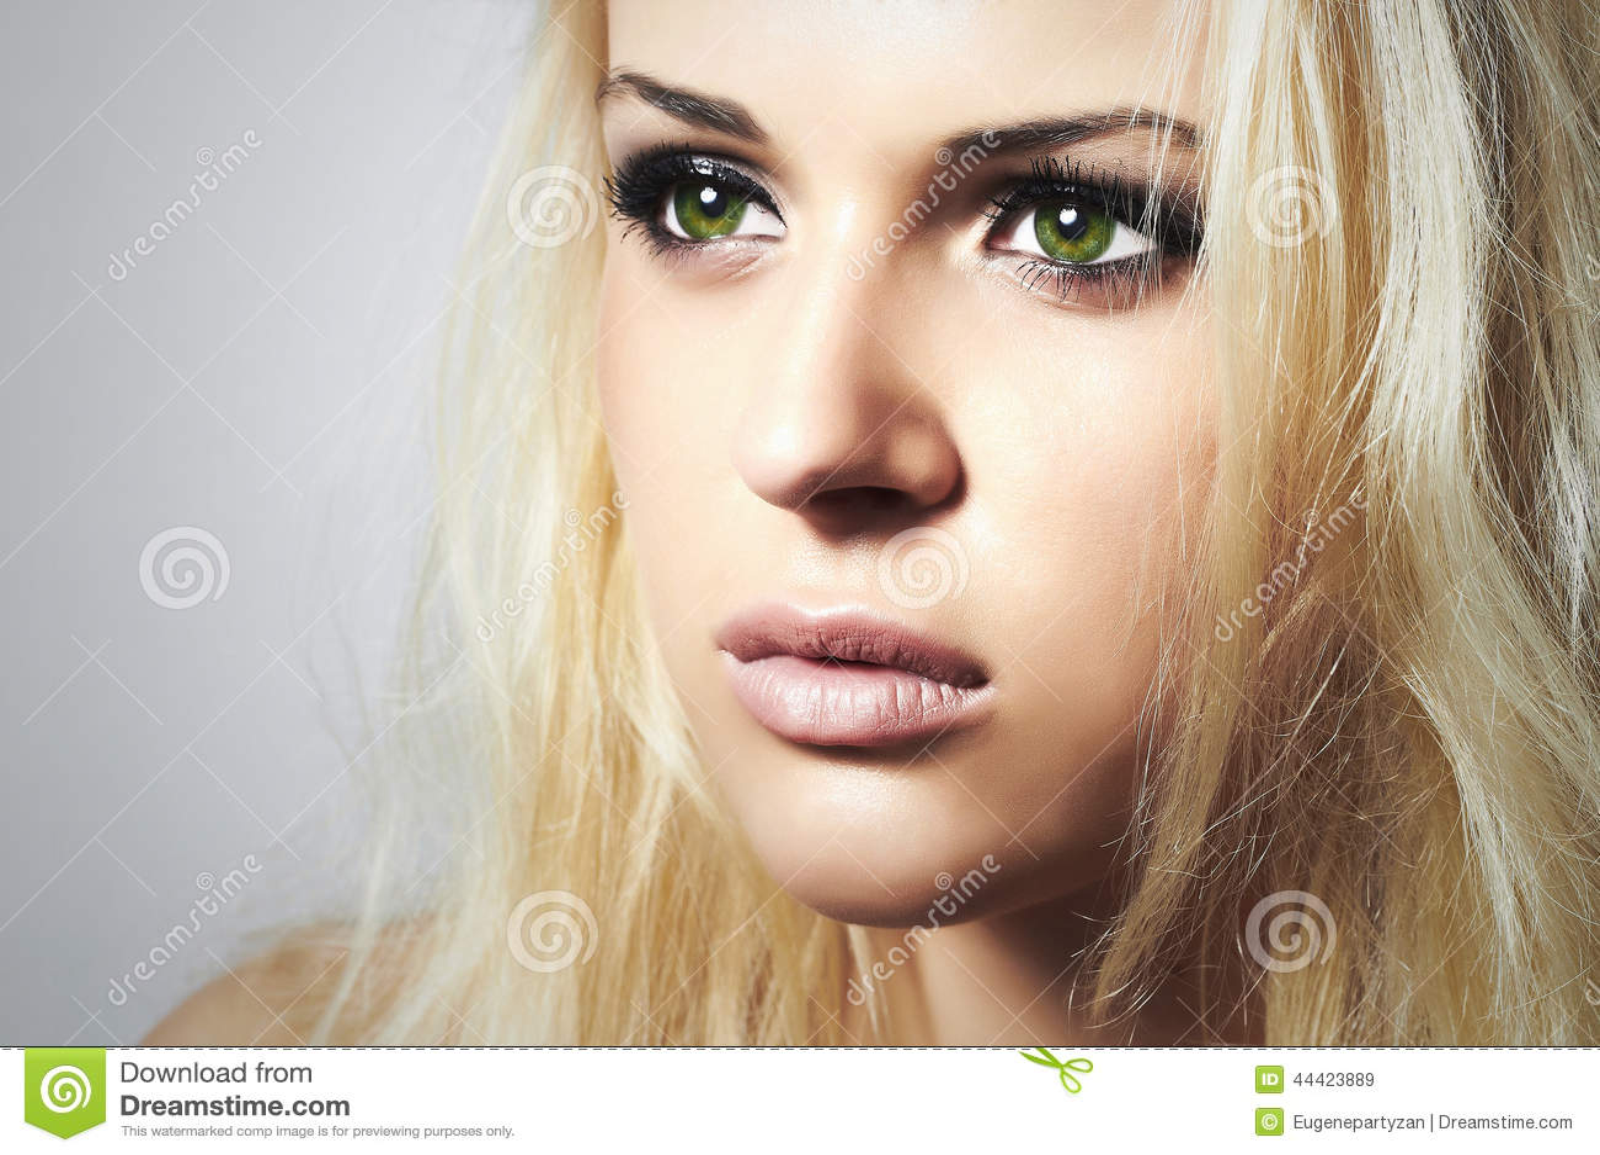 Van Morrison - Paroles de Brown Eyed Girl traduction